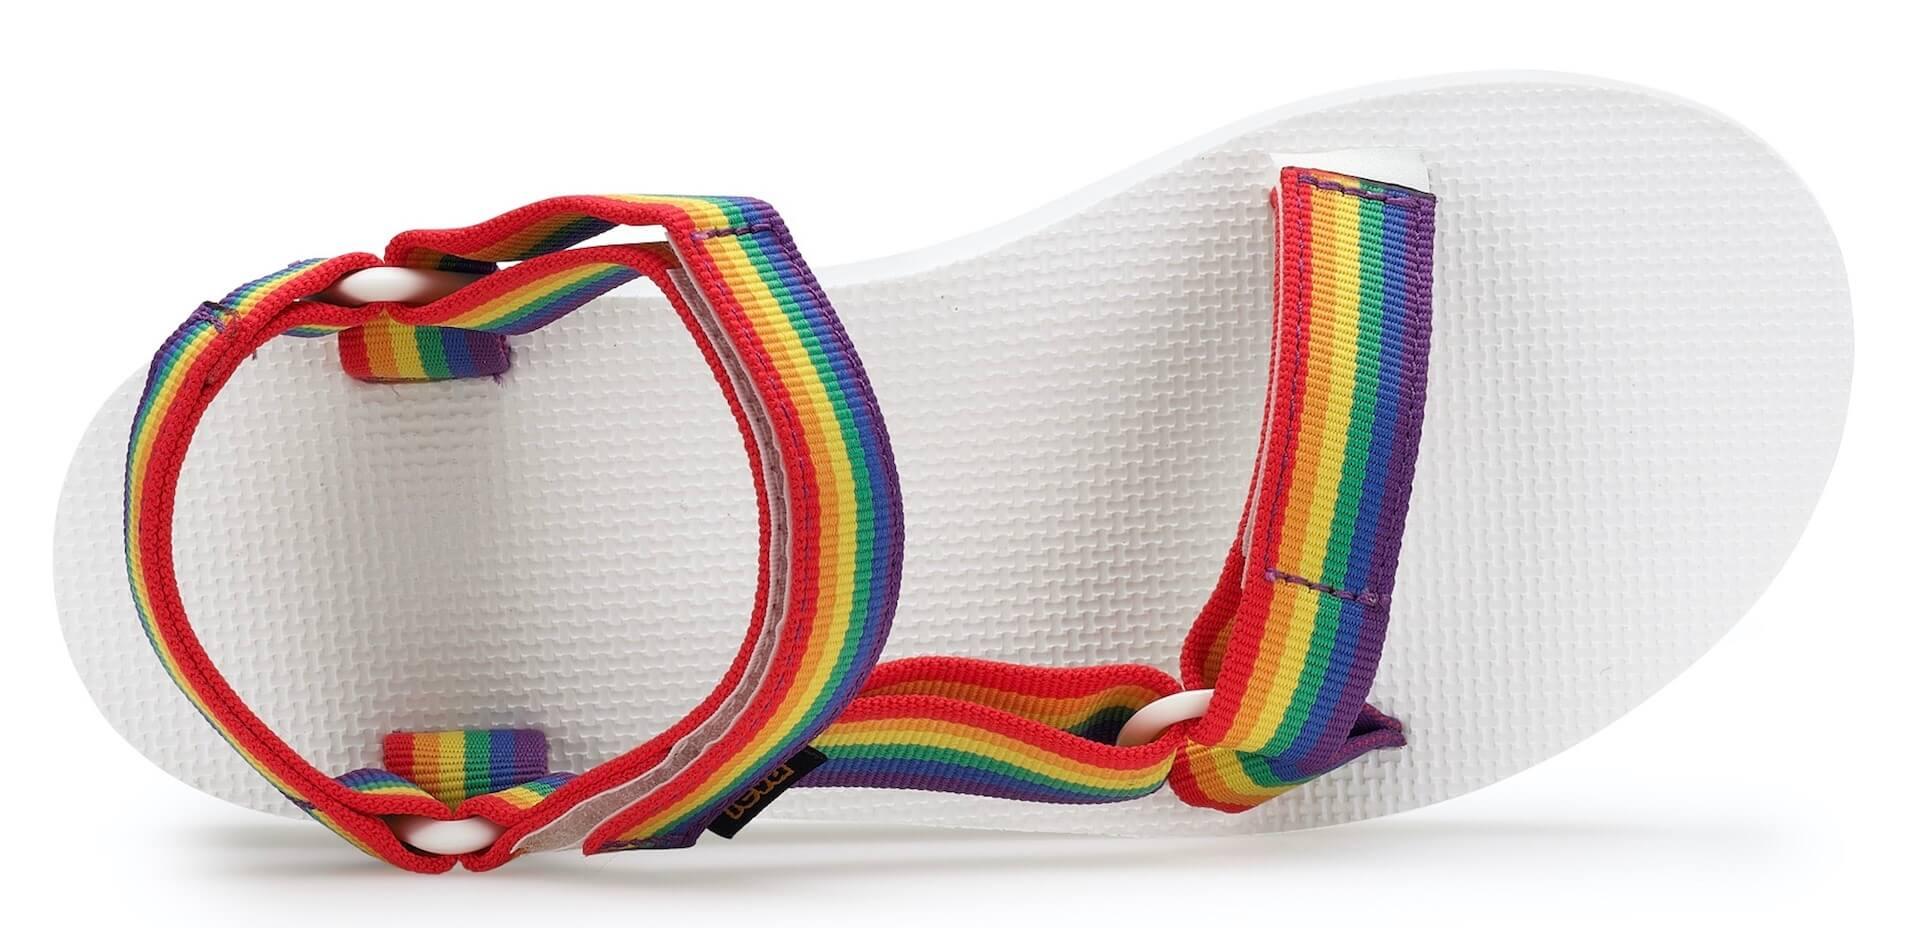 Tevaから、LGBTQ+支援団体「It Gets Better Project」記念サンダル登場!レインボーカラーの2種類 lf200421_teva_universal_17